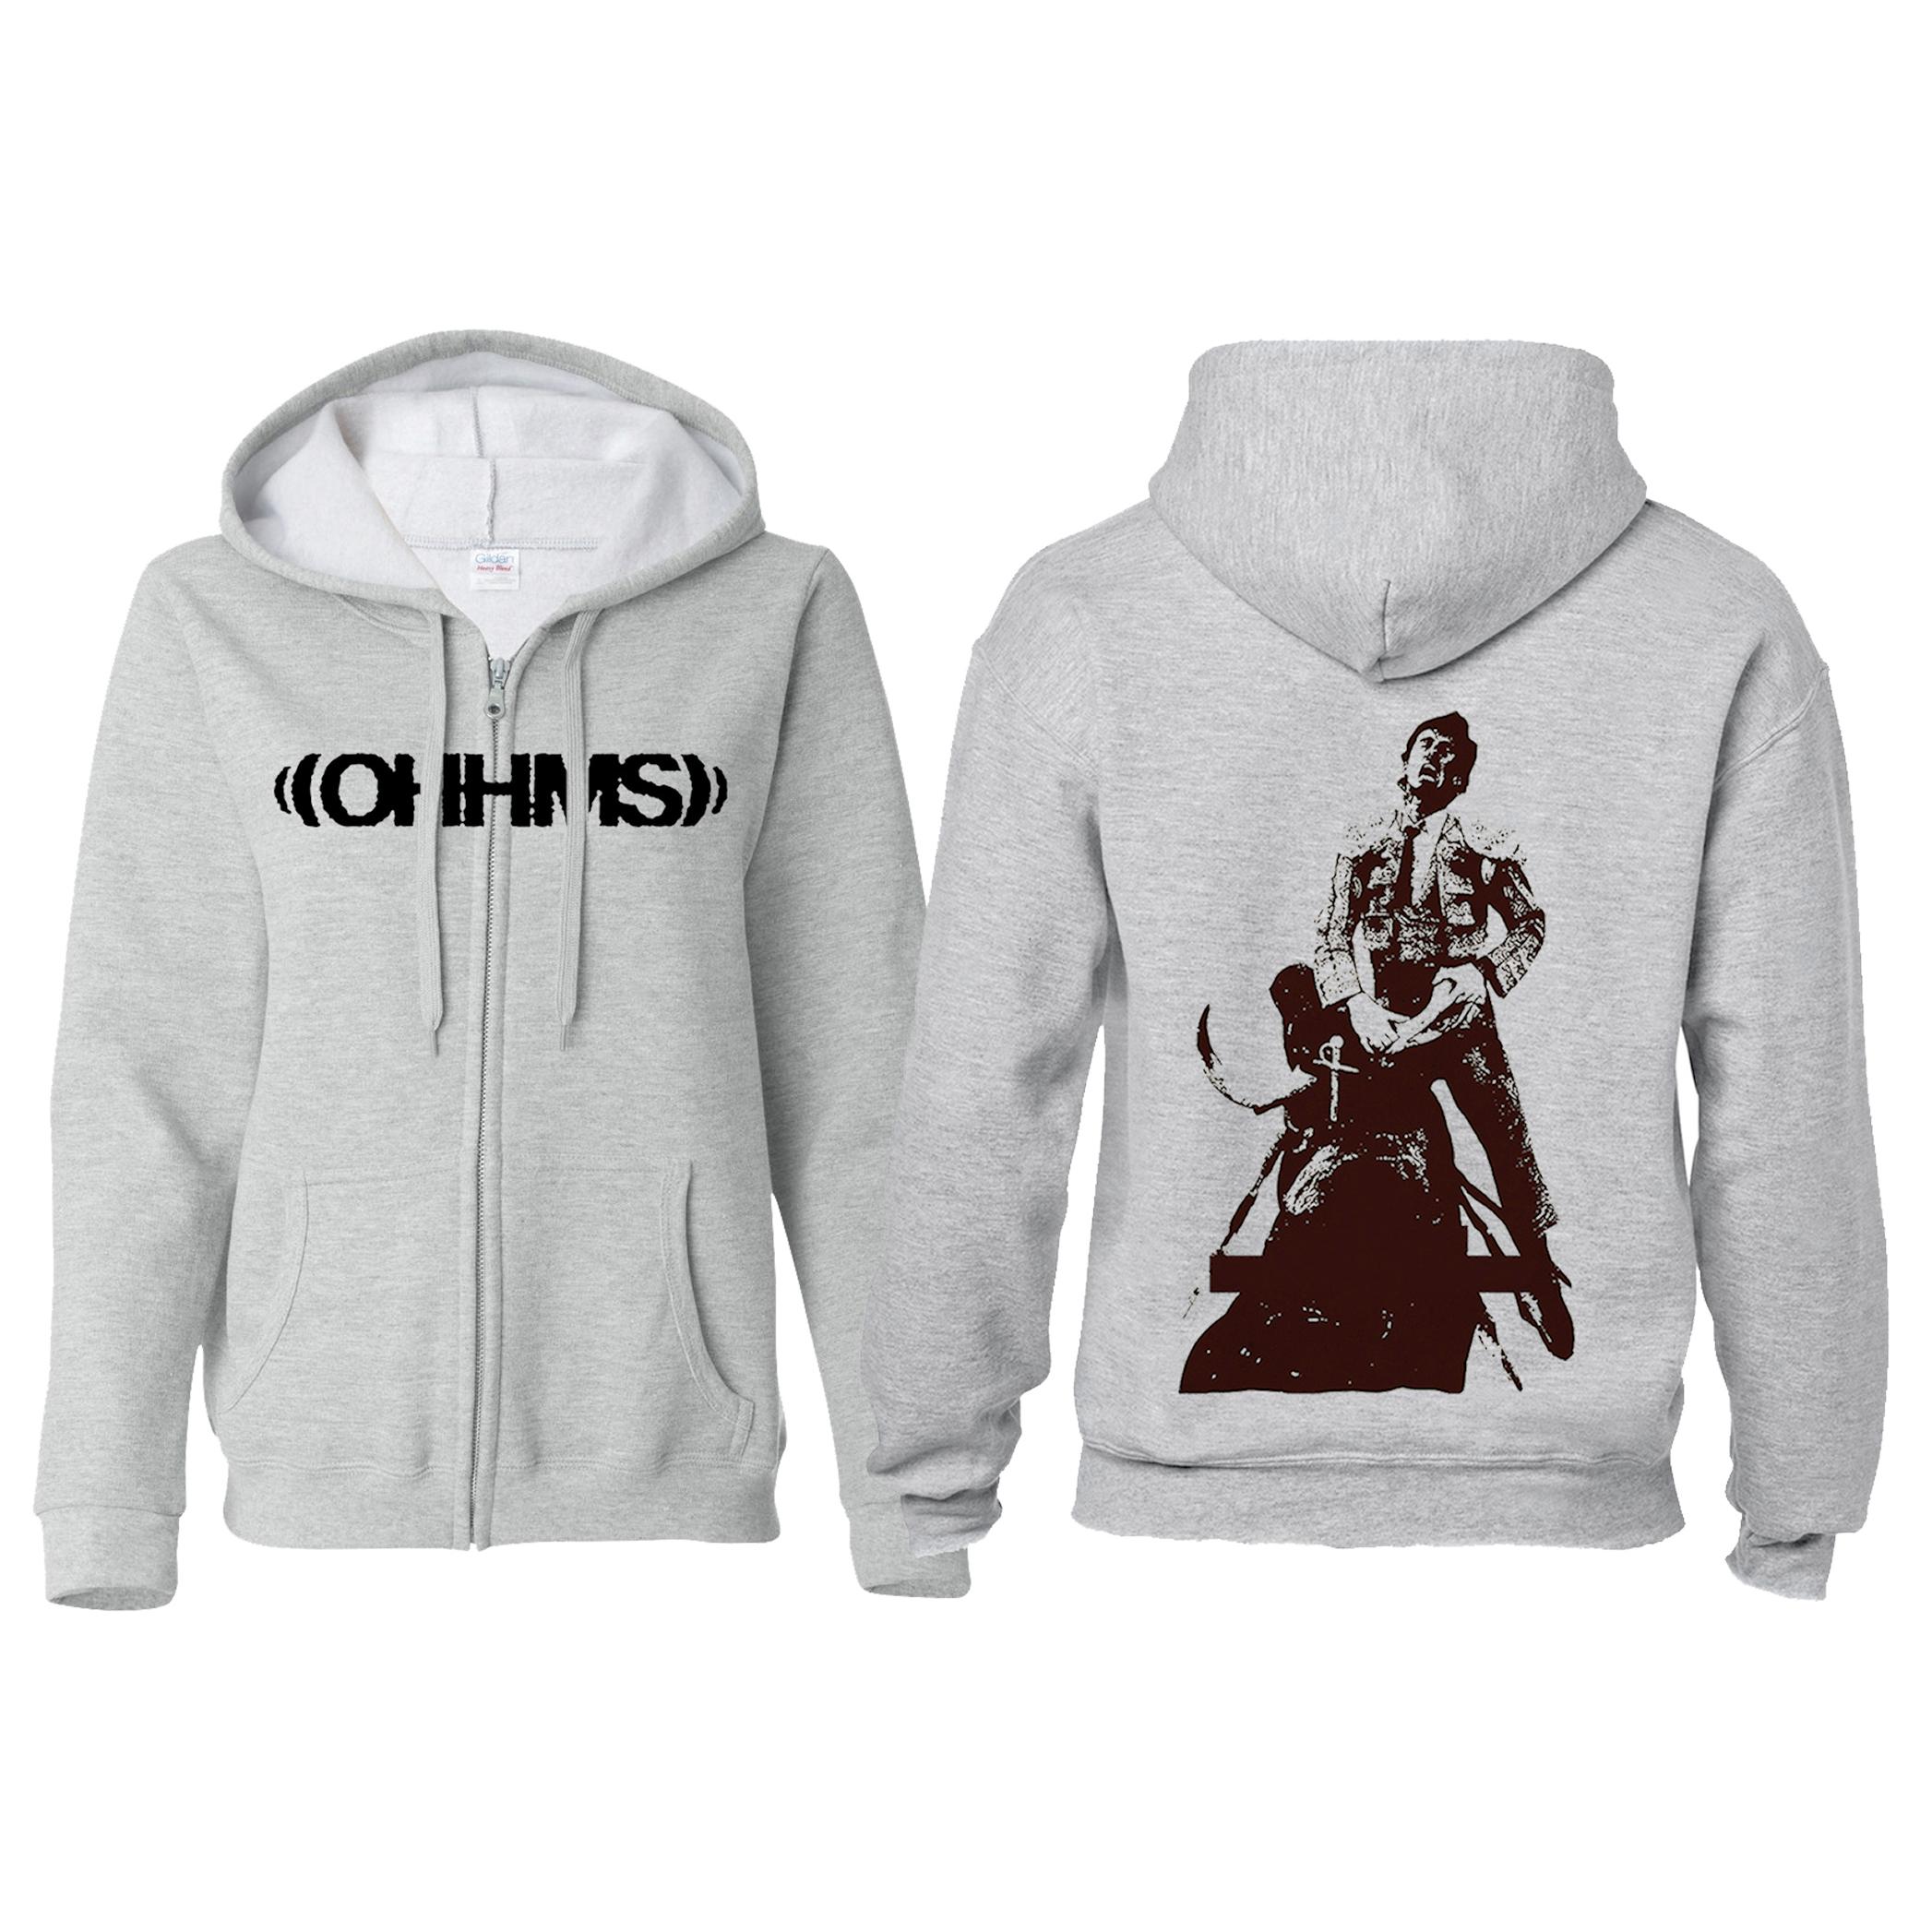 OHHMS - Exist Matador zip-up hoodie - Holy Roar Records Ltd